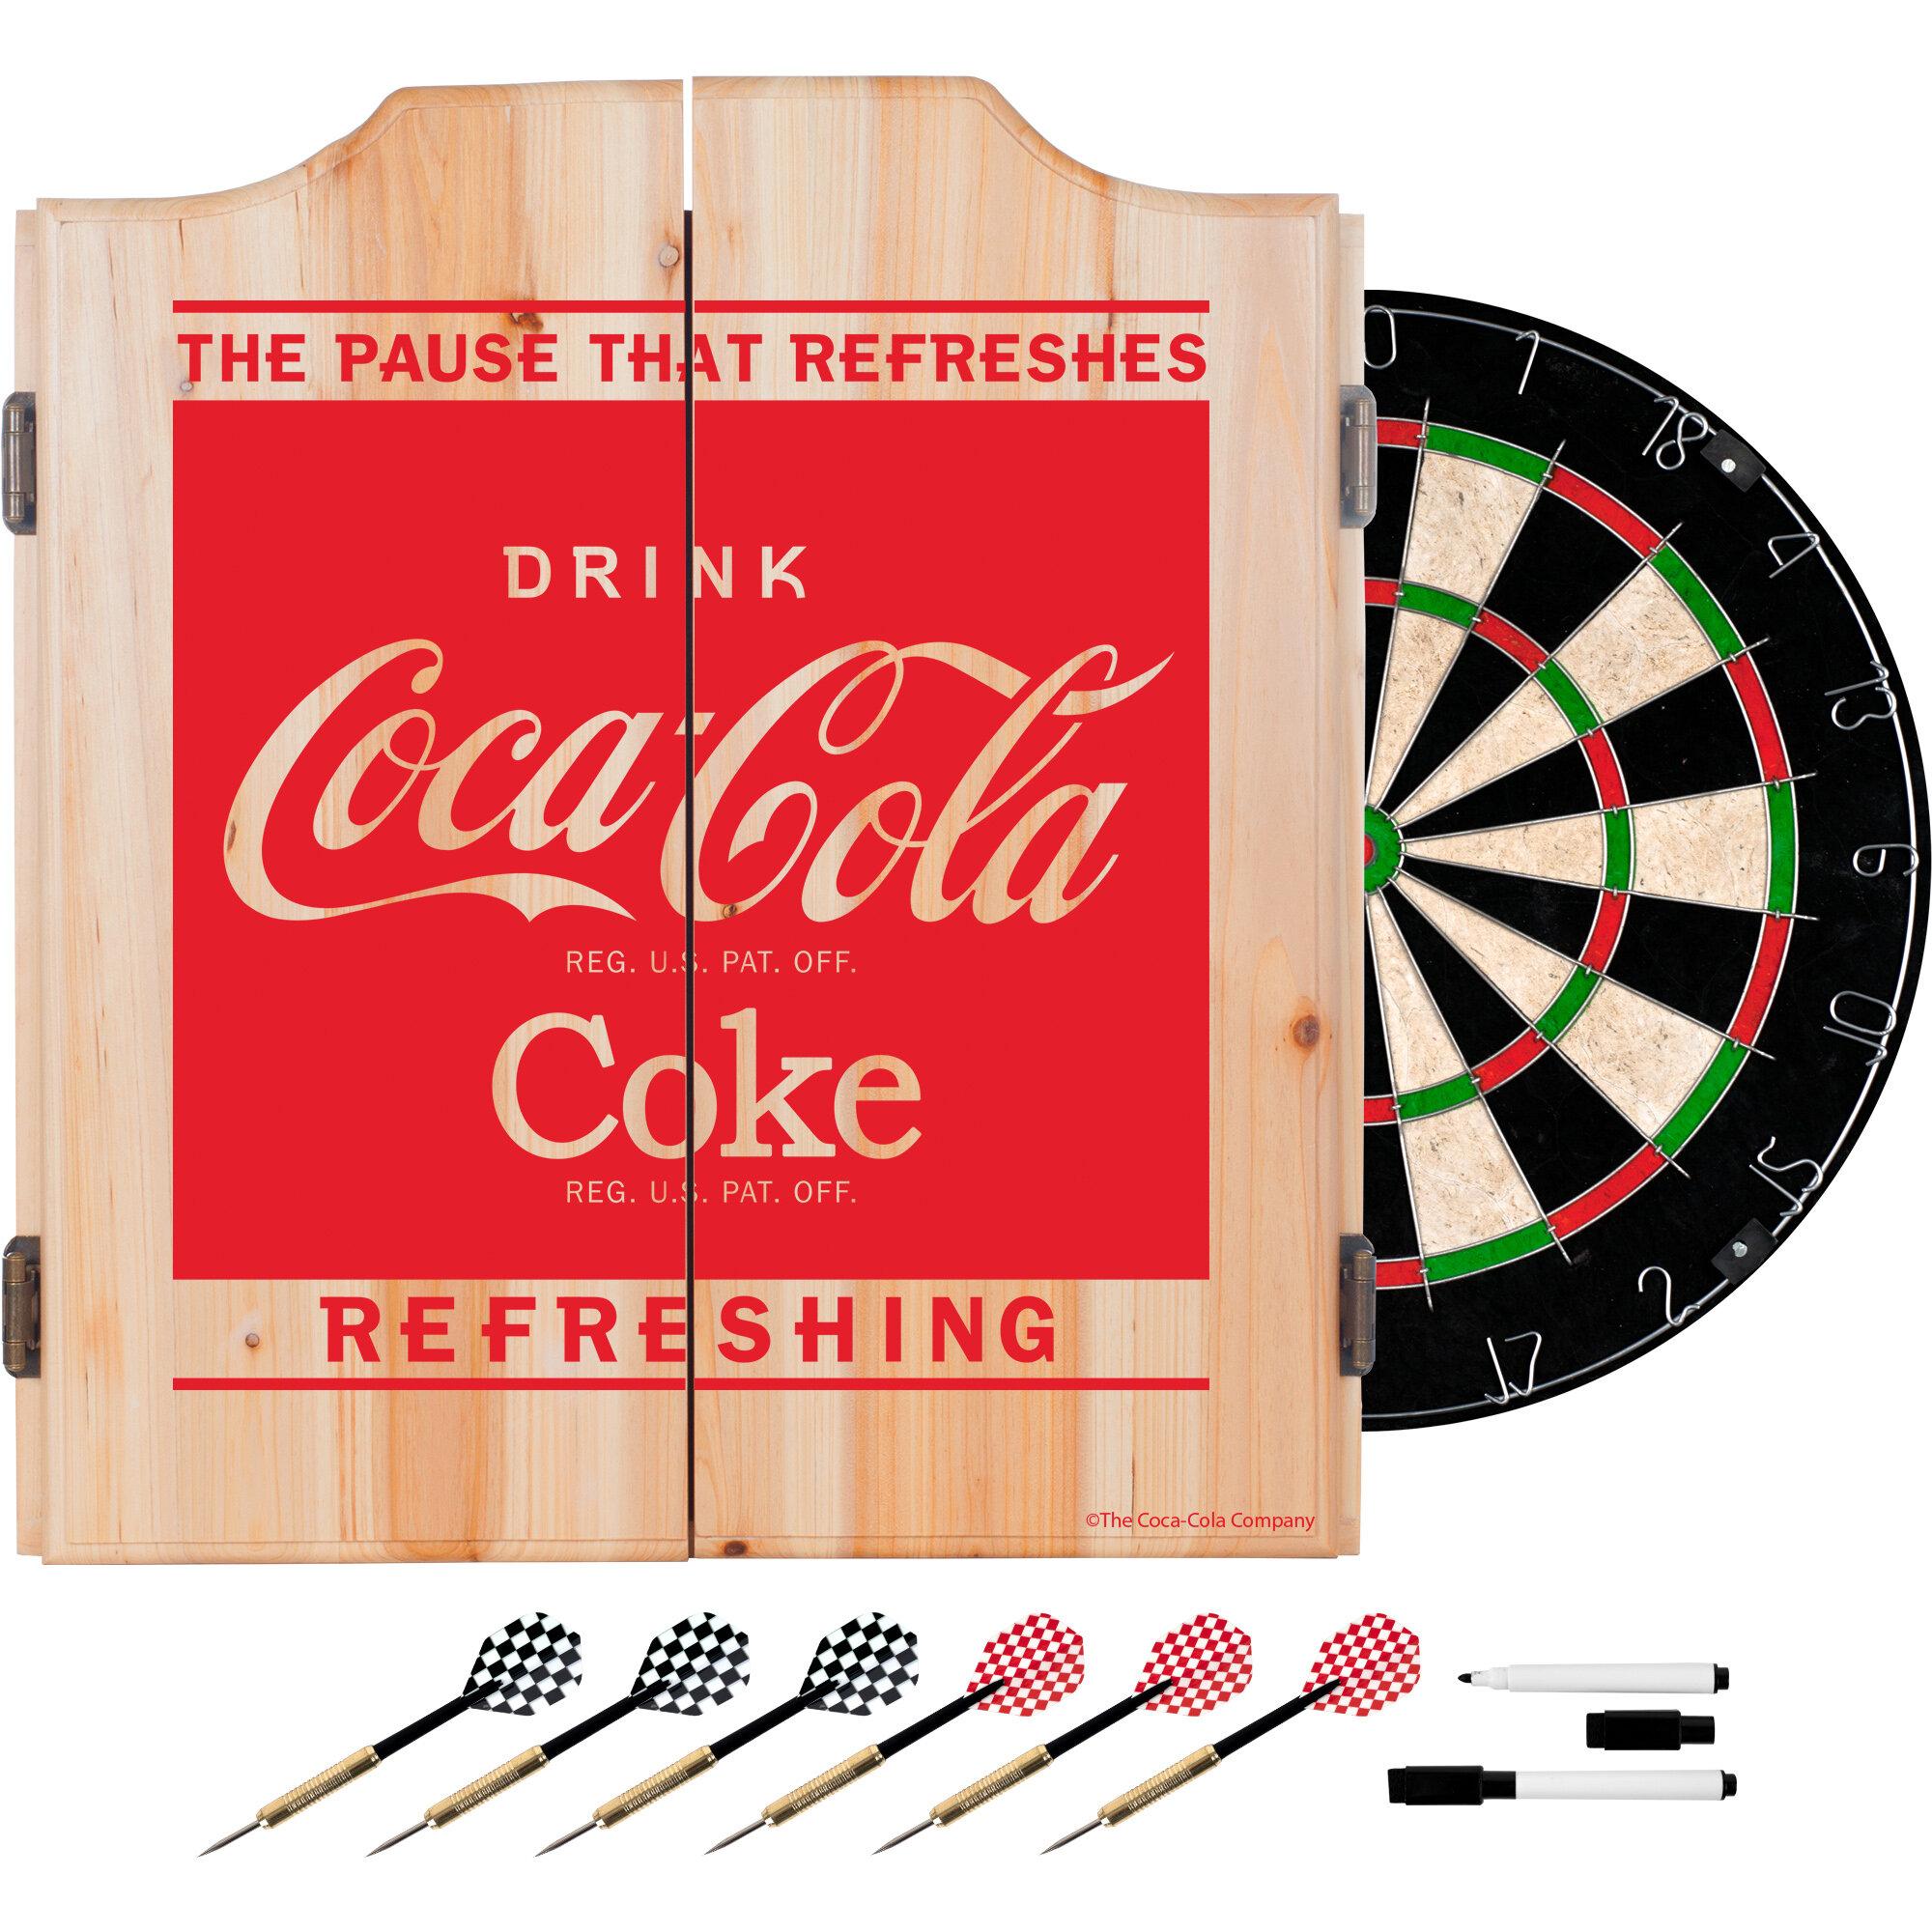 Beer And Beverage Bristle Dartboard Dartboards Cabinets You Ll Love In 2021 Wayfair